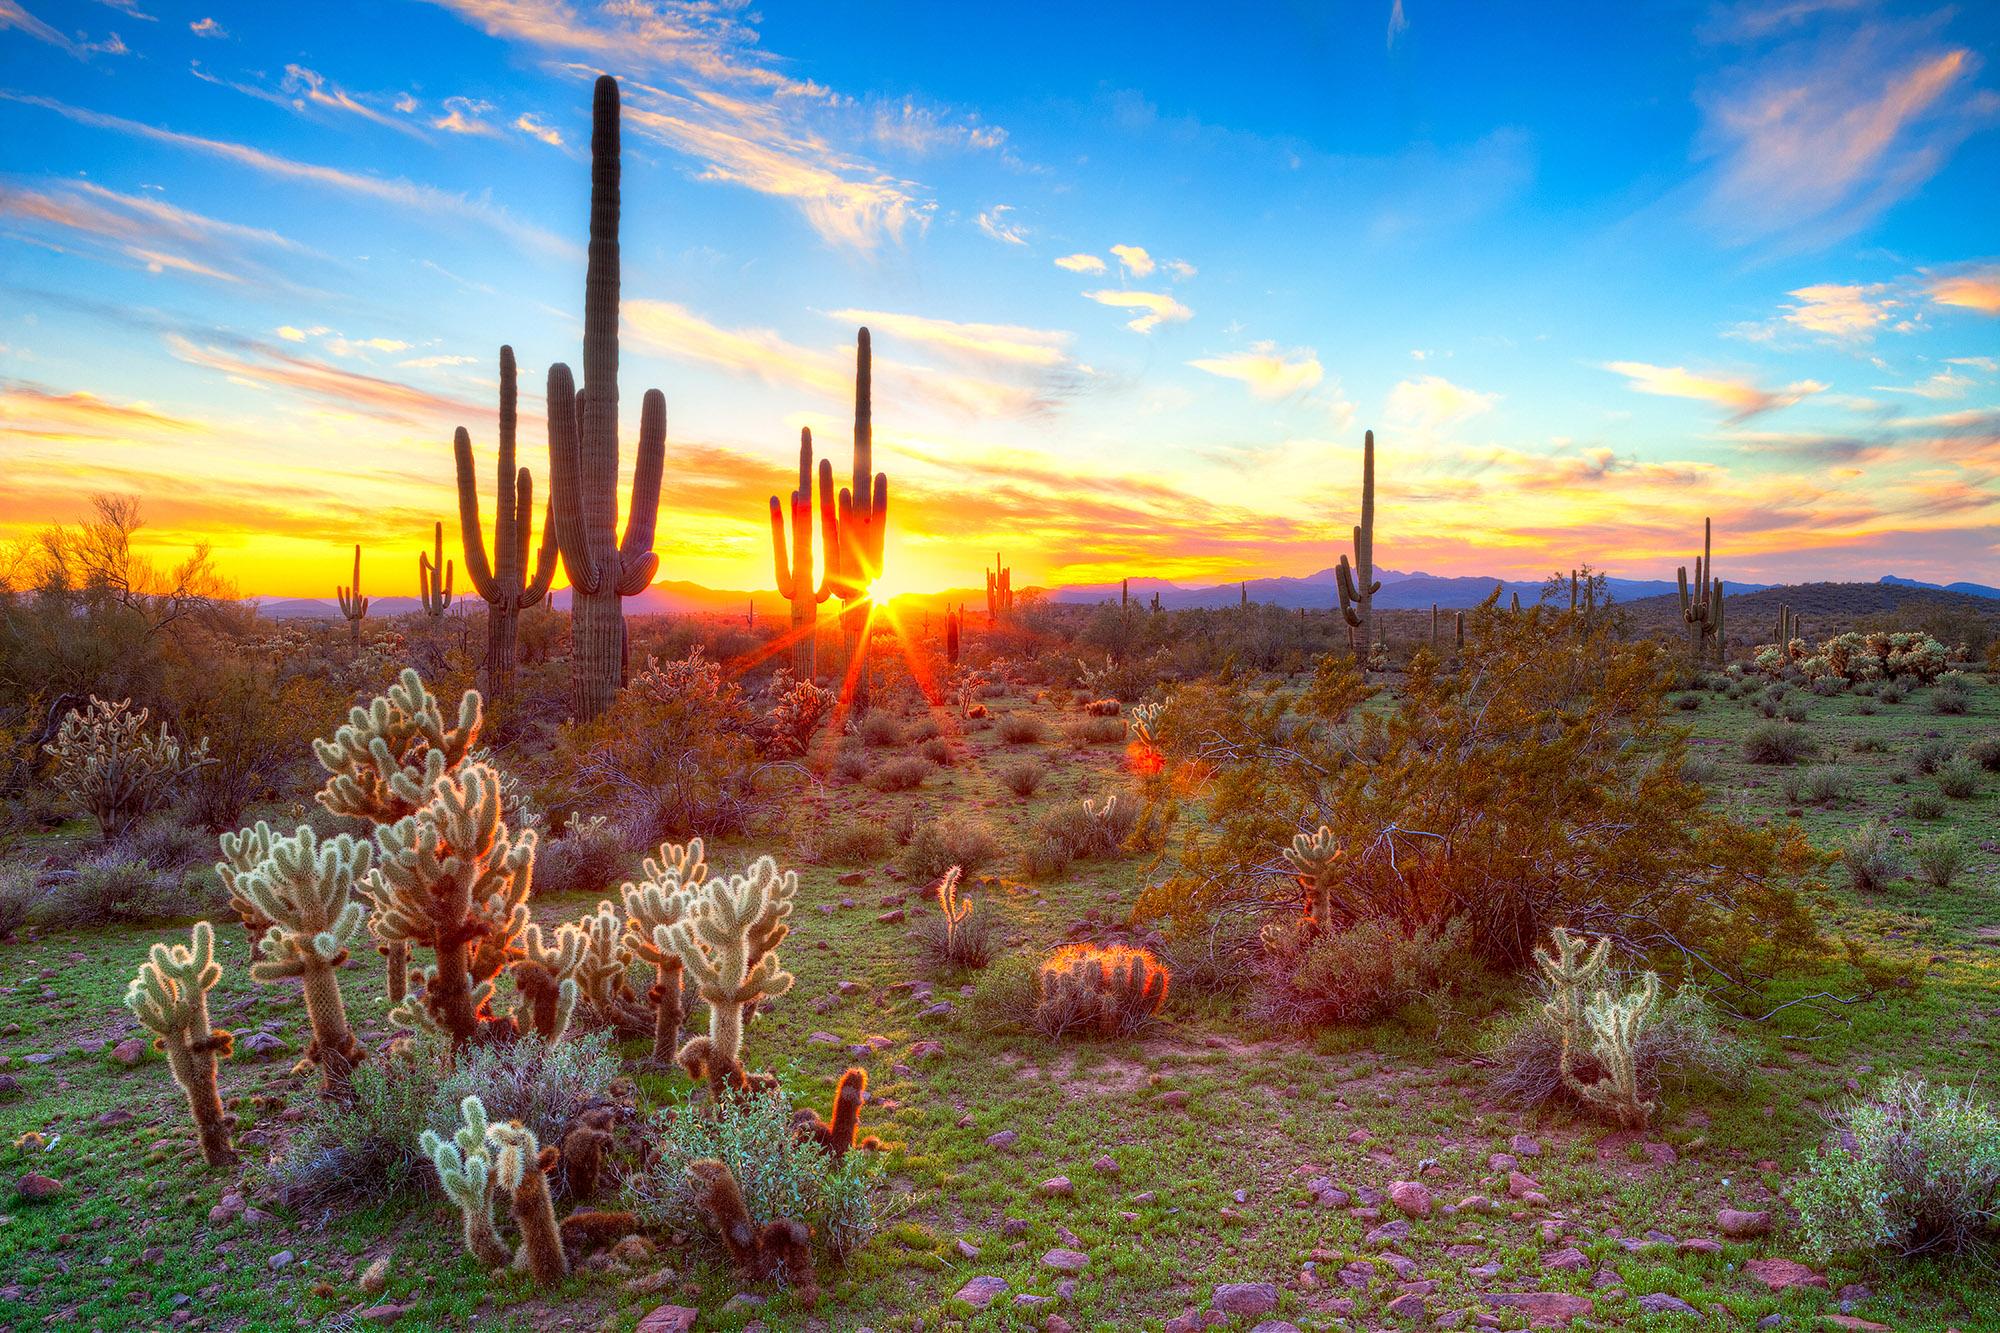 Sonoran Desert Landscape Sunrise